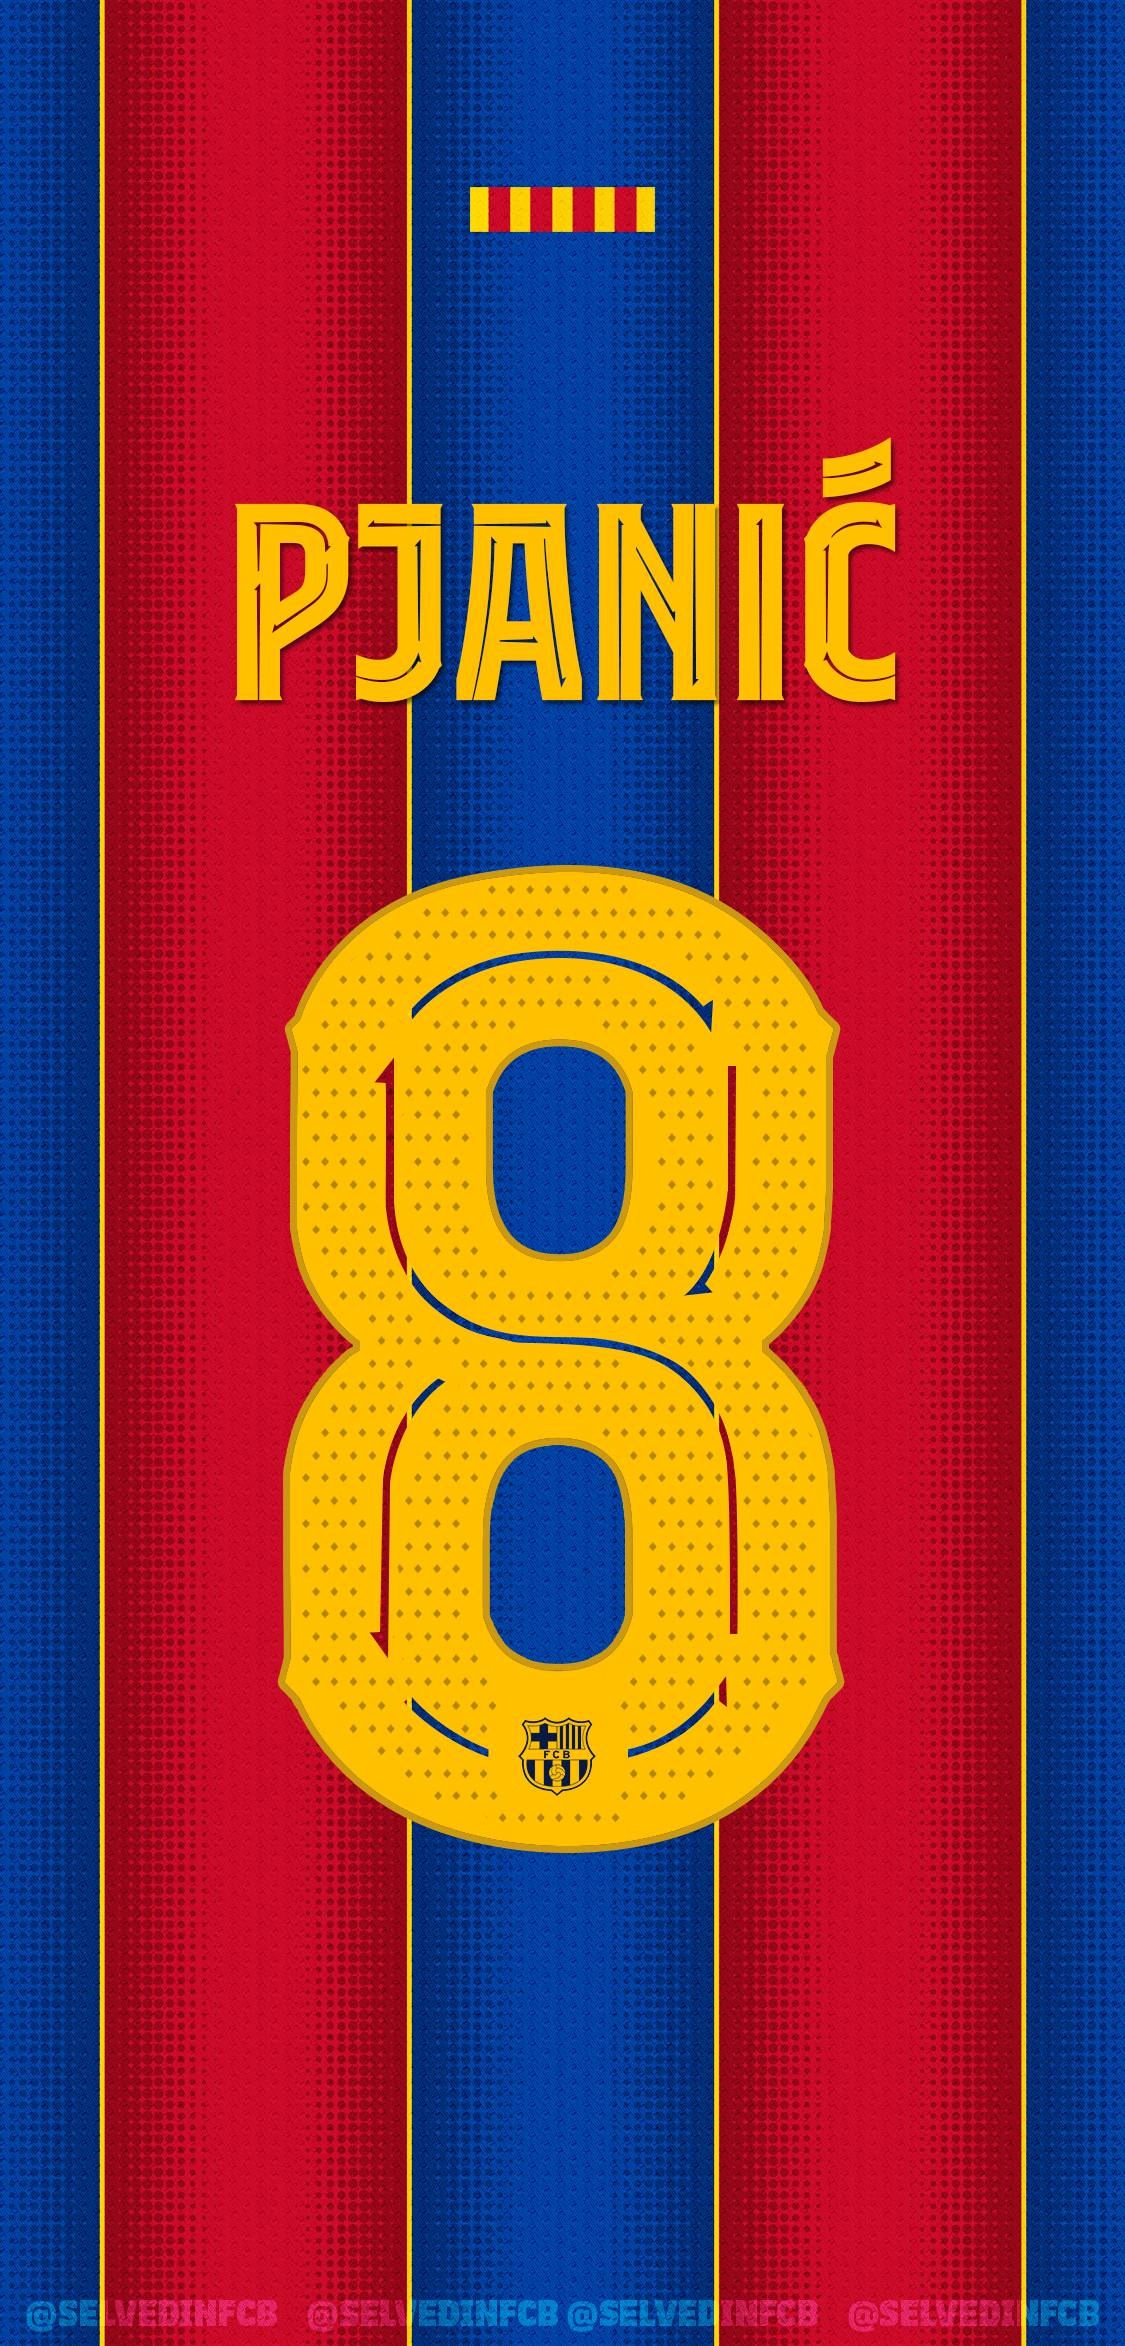 Miralem Pjanic Fc Barcelona Wallpaper 2020 By Selvedinfcb On Deviantart